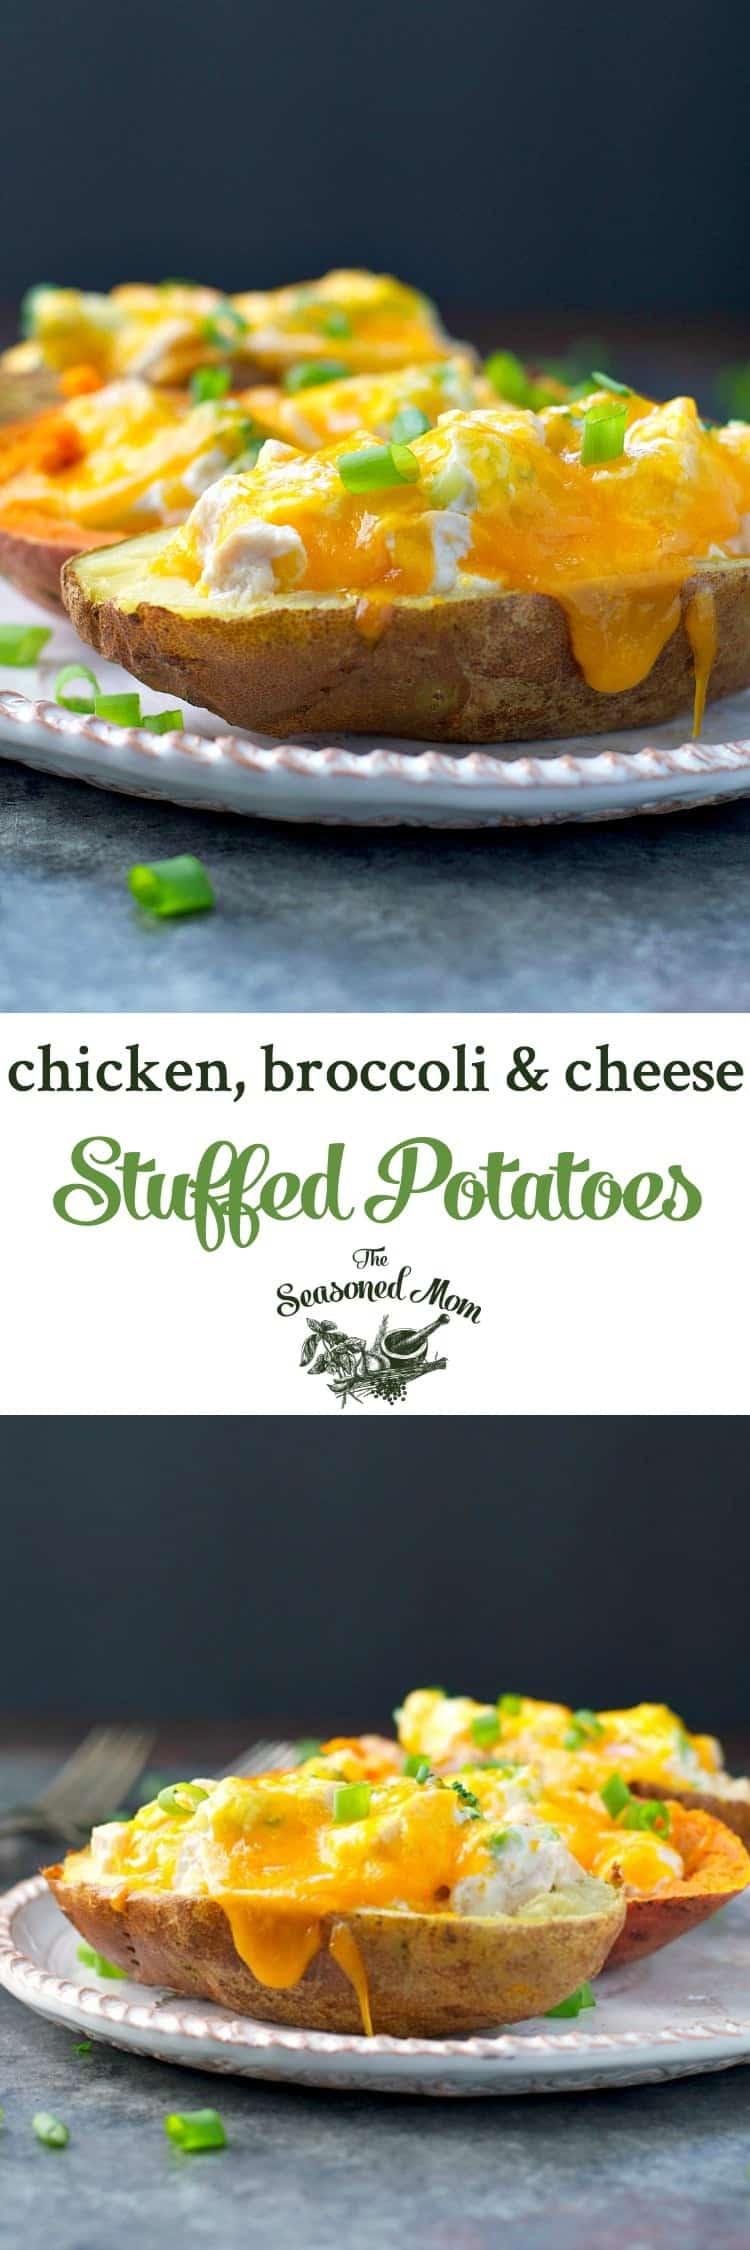 Chicken, Broccoli And Cheese Stuffed Potatoes - The Seasoned Mom-9533